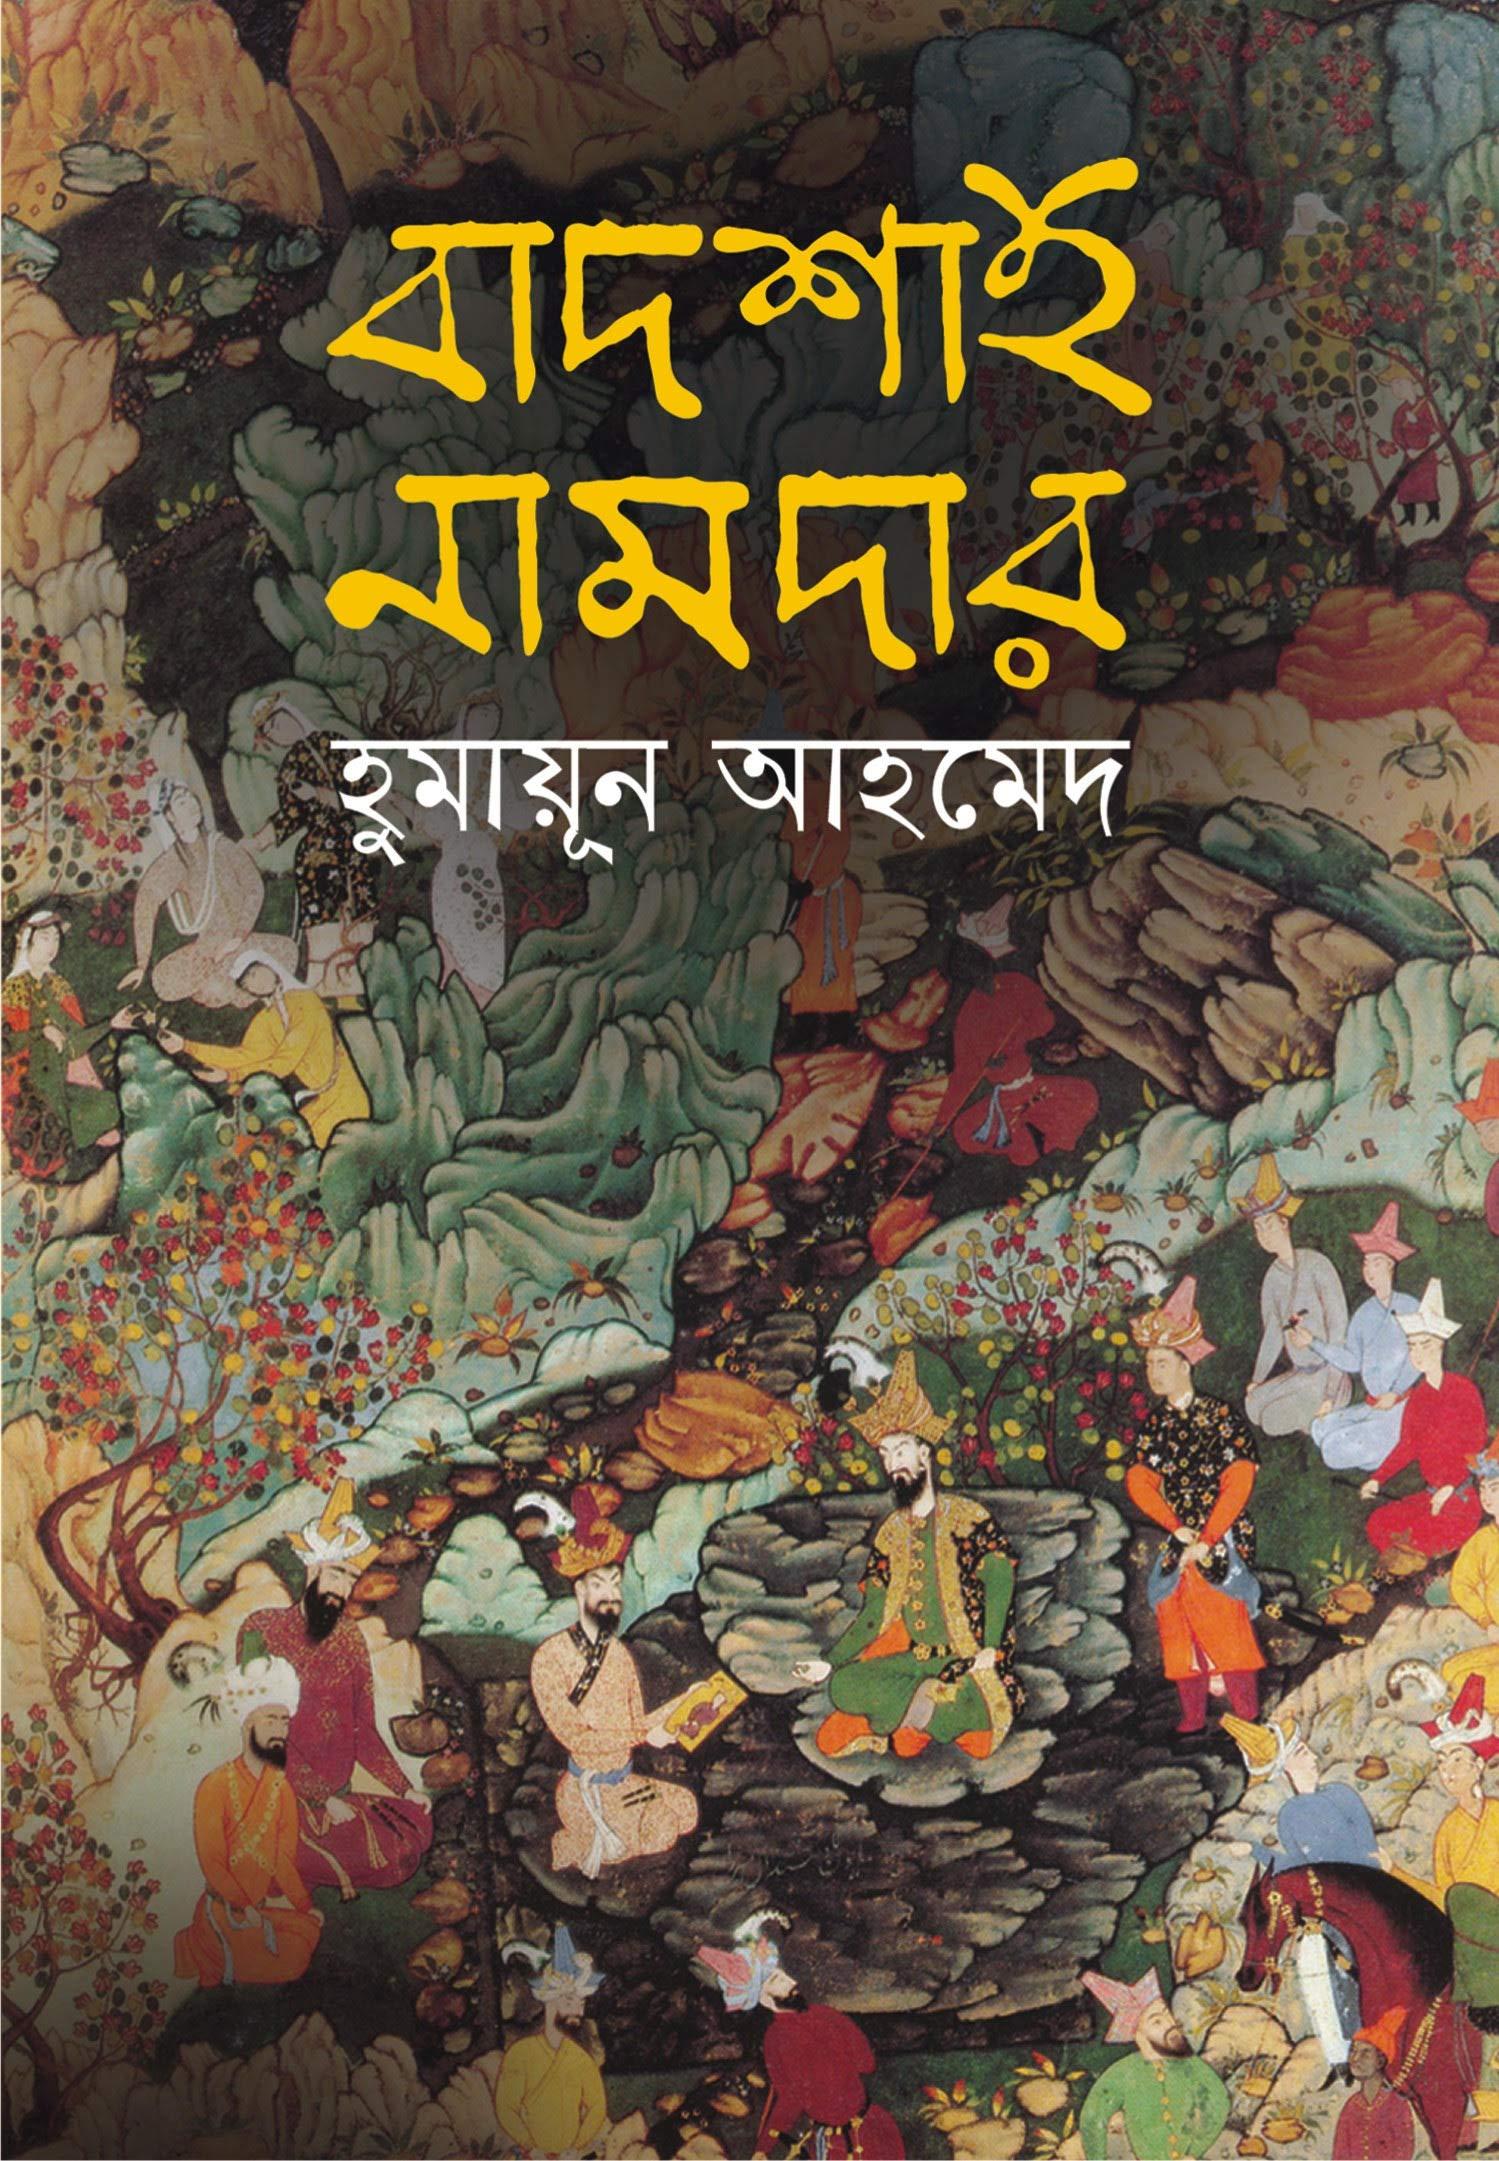 BADSHAH NAMDAR Bengali Book Humayun Ahmed Mughal Empire Indian History Bangla Novel Upanyas [Hardcover] HUMAYUN AHMED